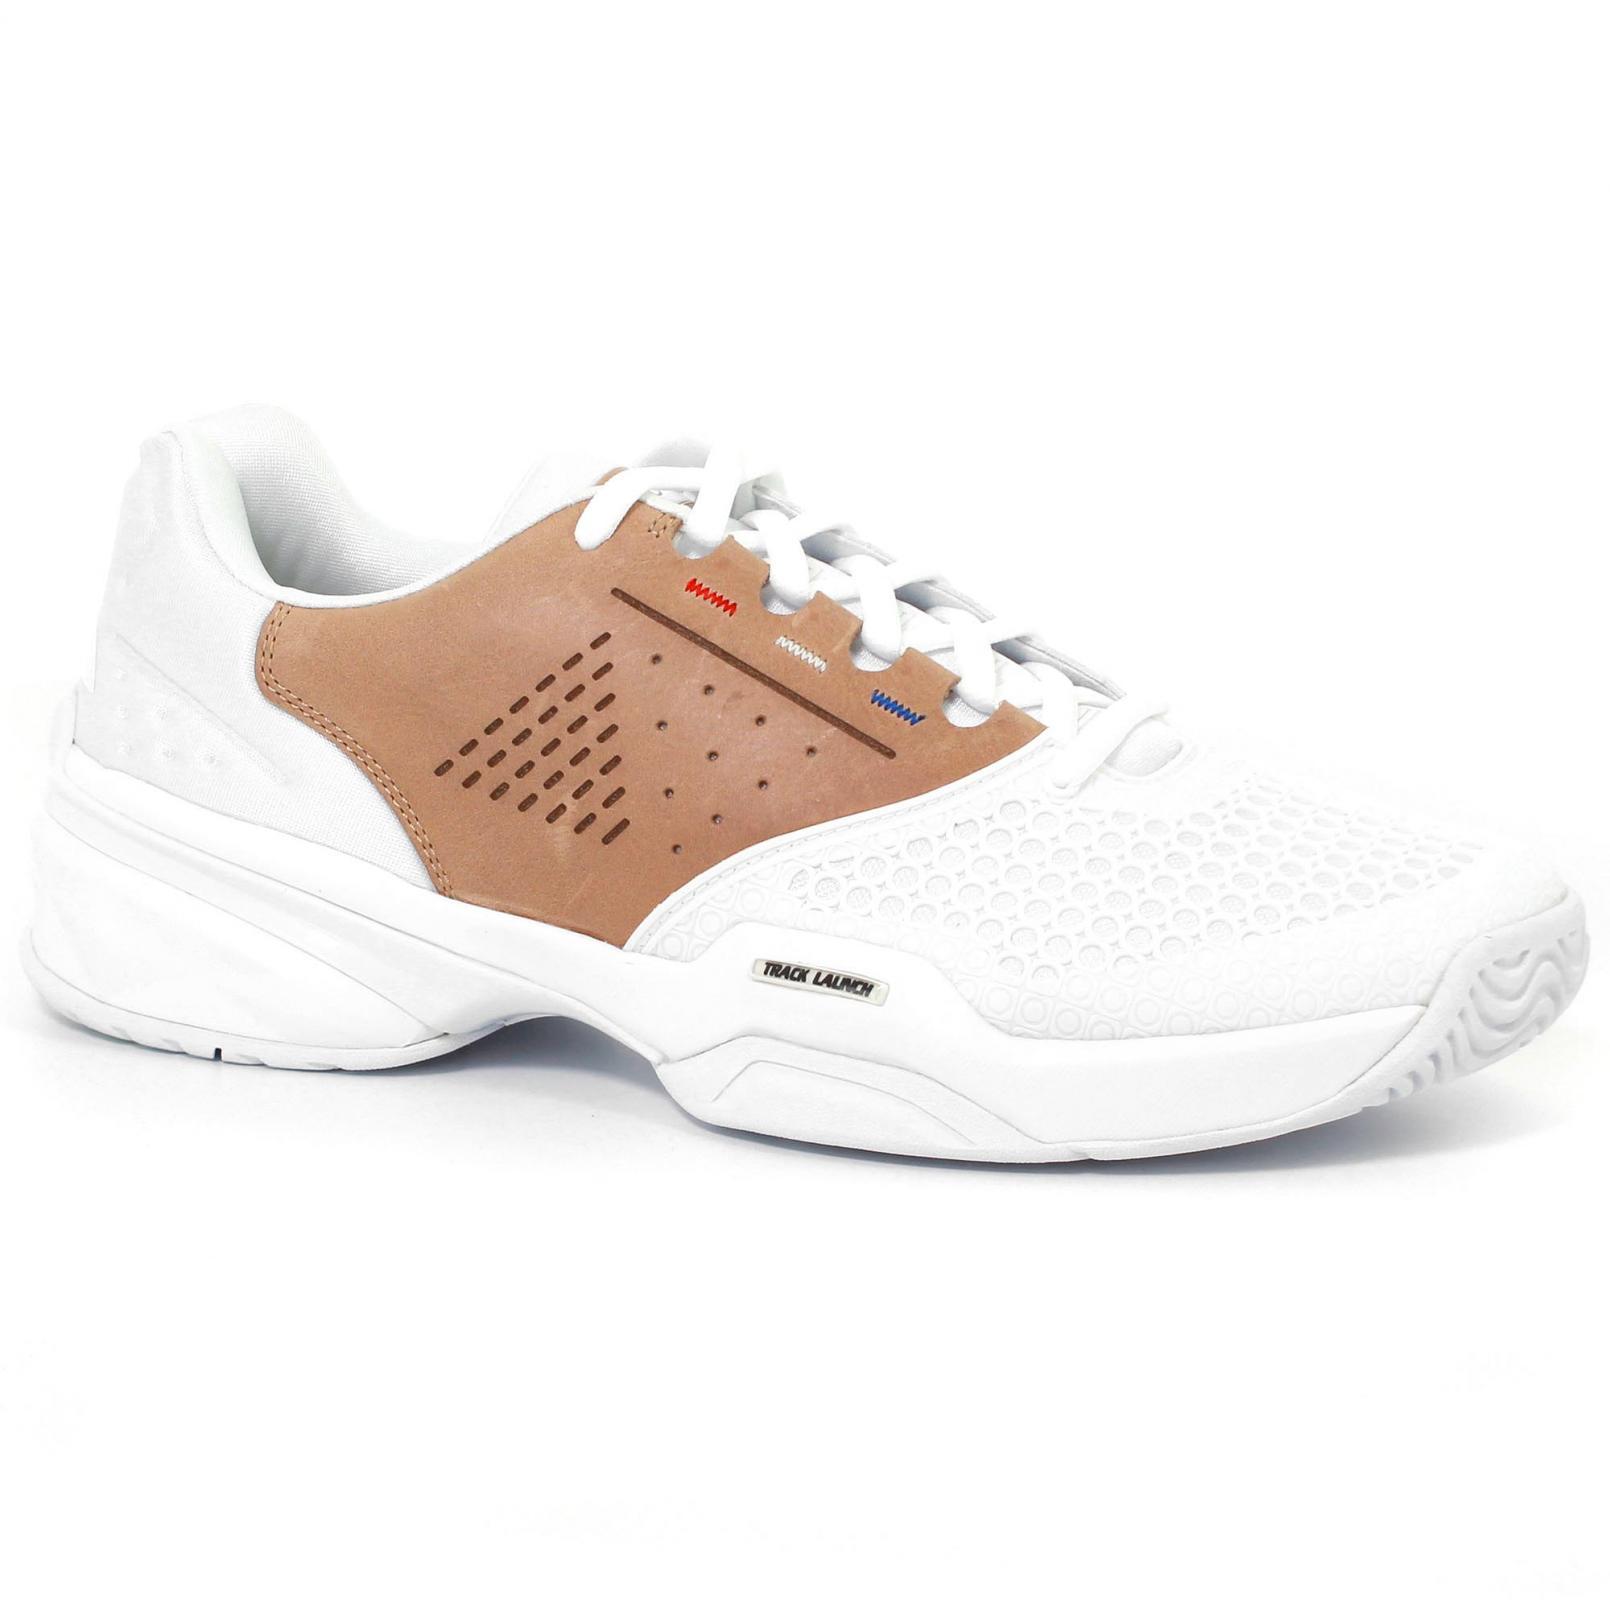 Shoes – Le Coq Sportif Lcs T Pro Mesh White/Cream